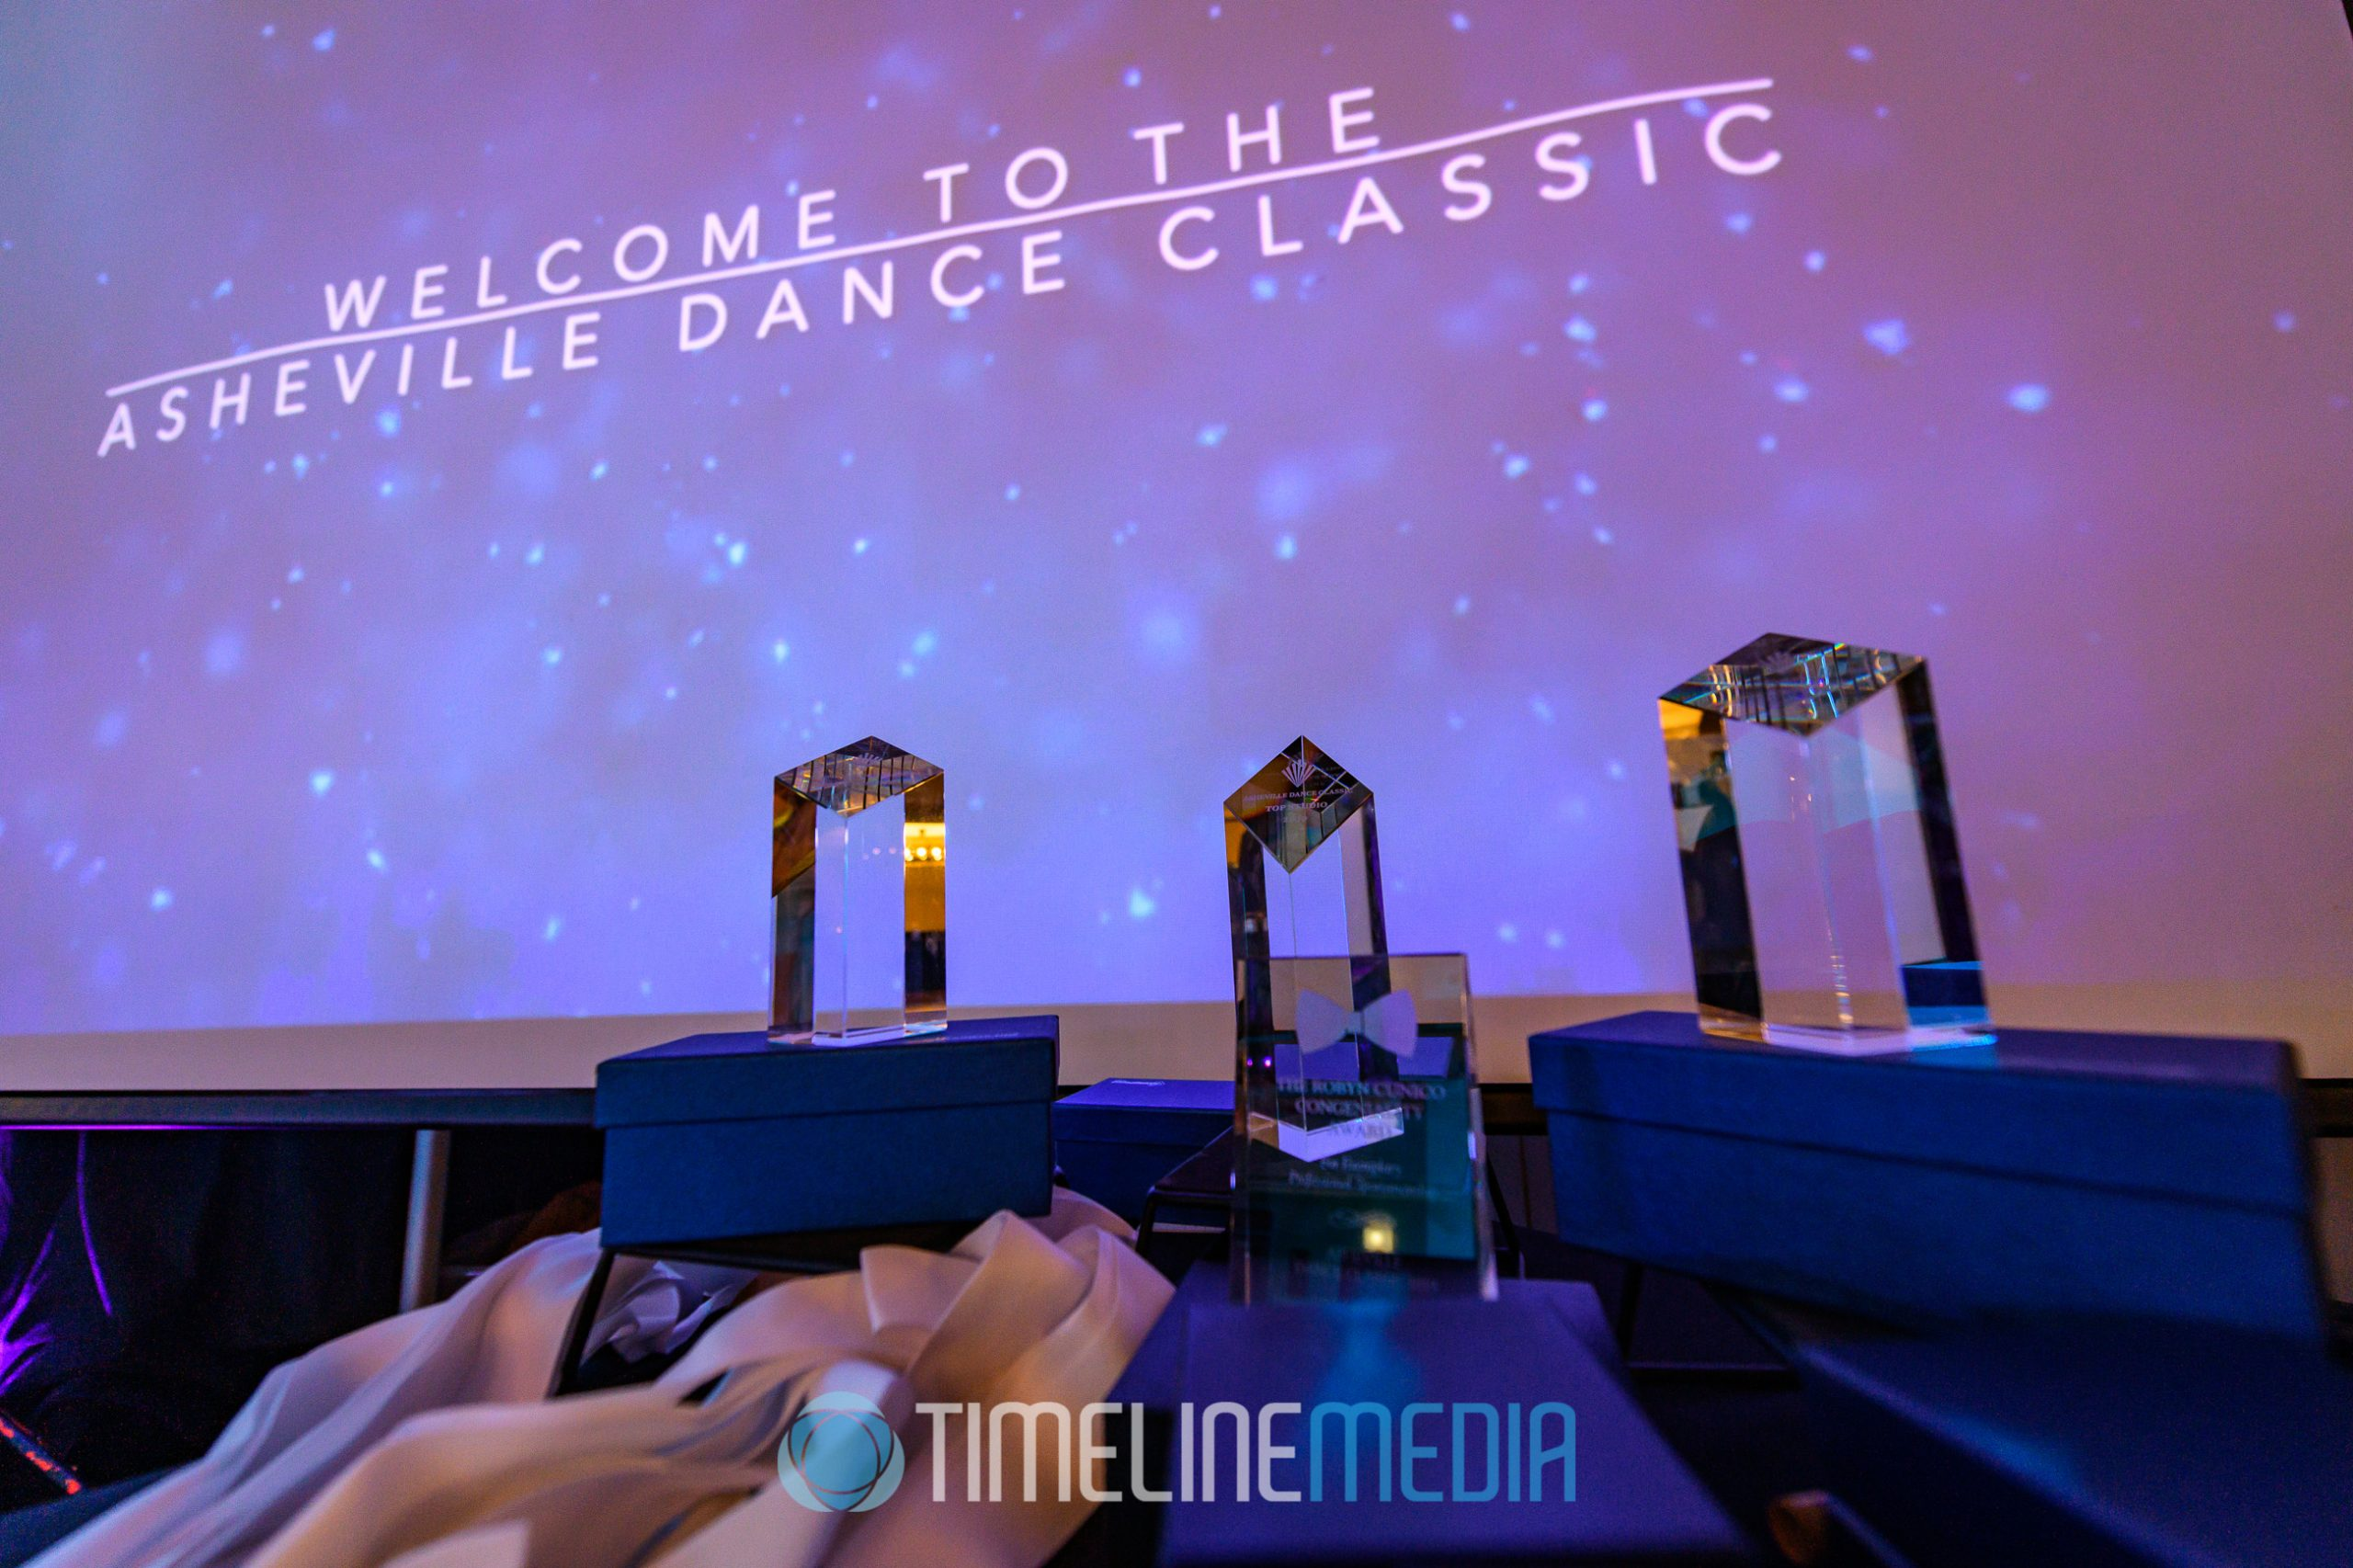 Awards of the Asheville Dance Classic ©TimeLine Media